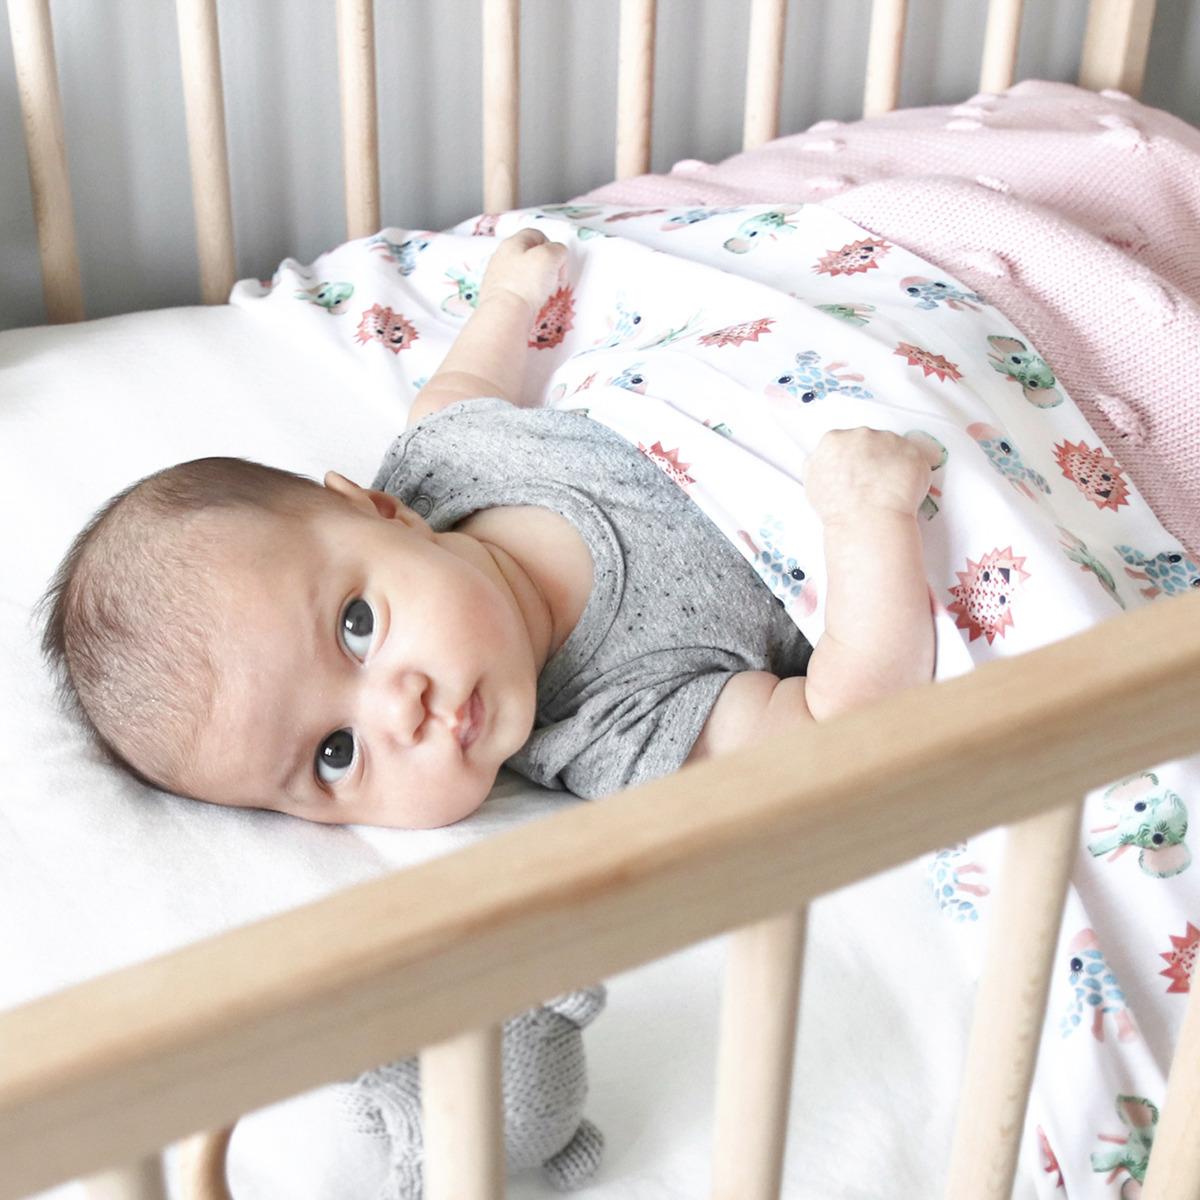 Baby En Peuterbed.Wieg Of Ledikant Opmaken